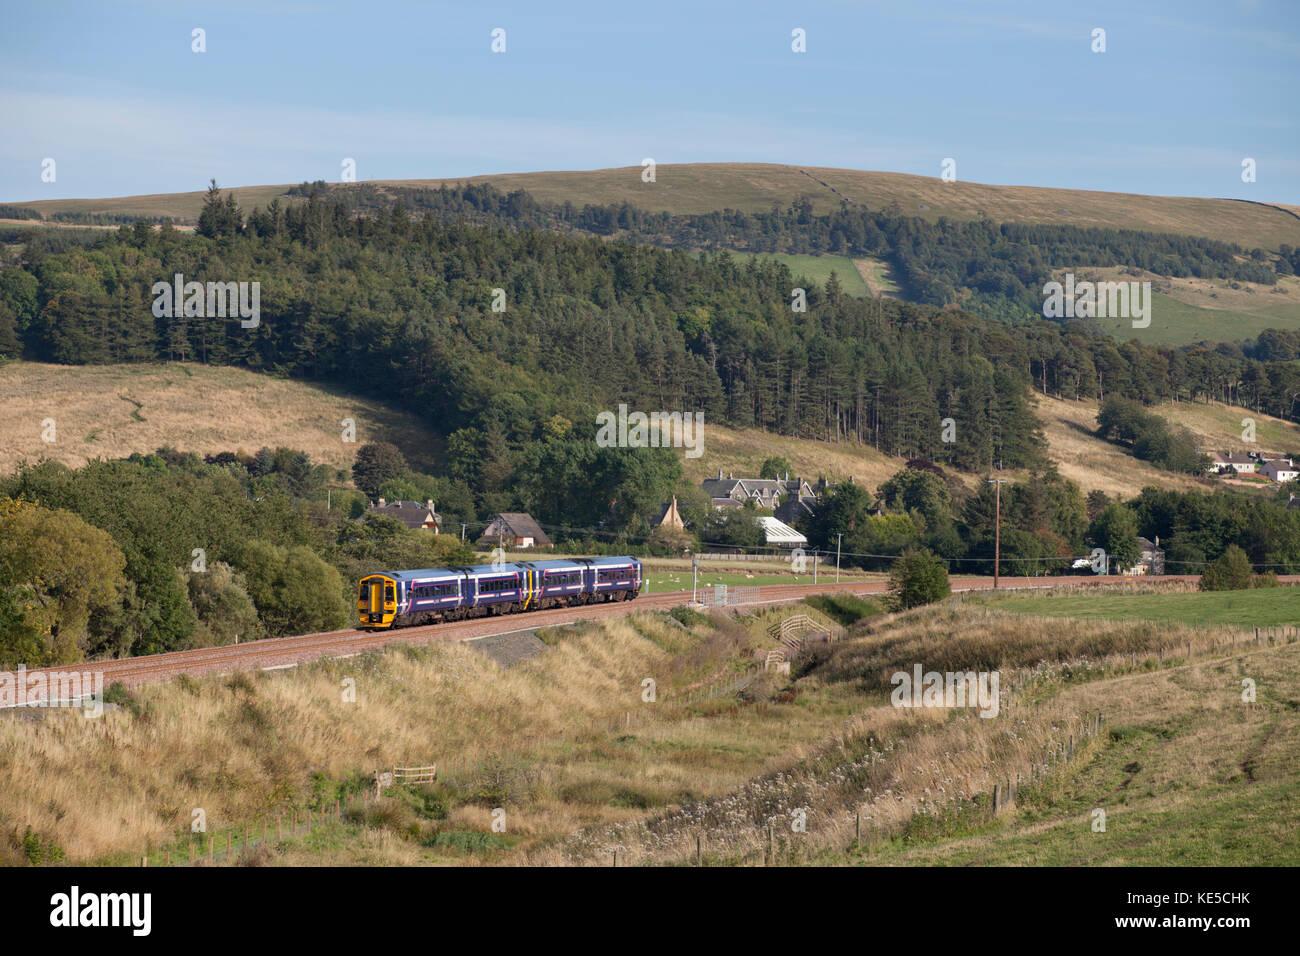 The 1511 Edinburgh - Tweedbank Scotrail train arrives at Stow on the borders railway line - Stock Image